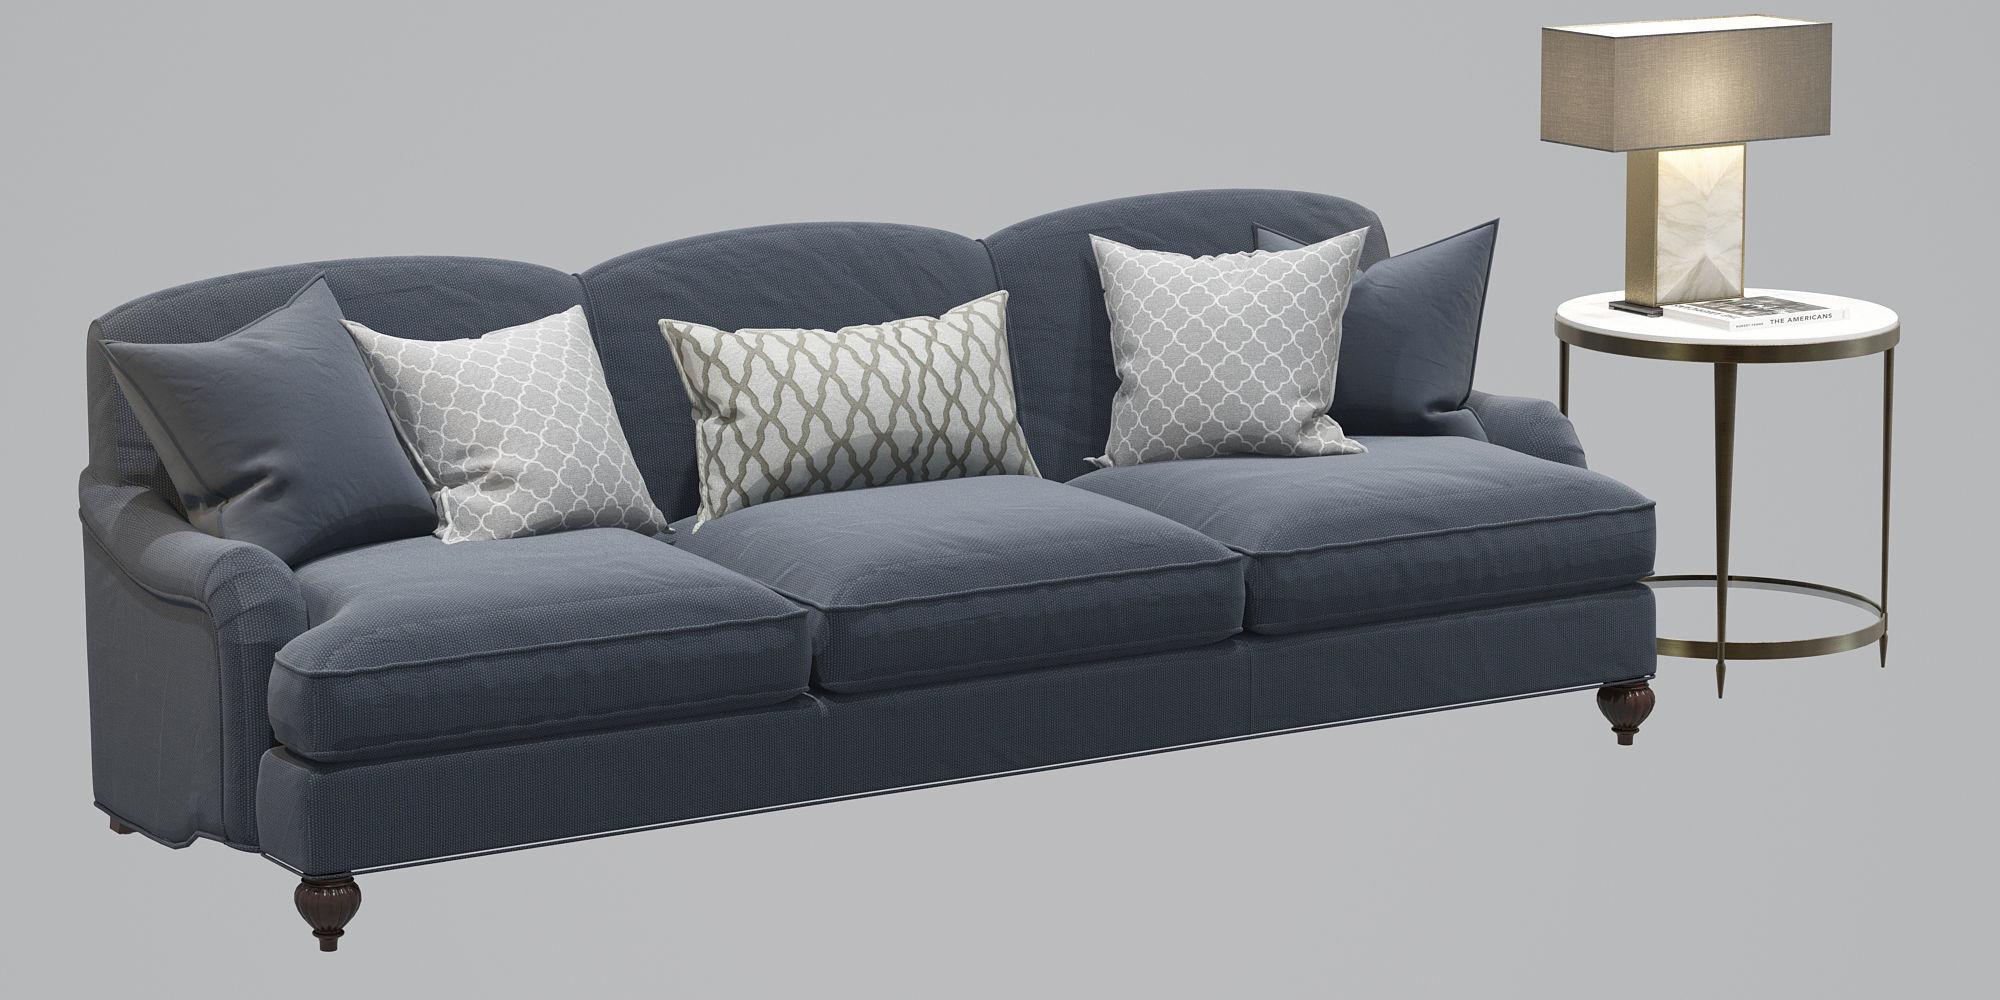 baker furniture max sofa big sofas l ga%c2%bcnstig kaufen oval Диван диваны pinterest pheasant